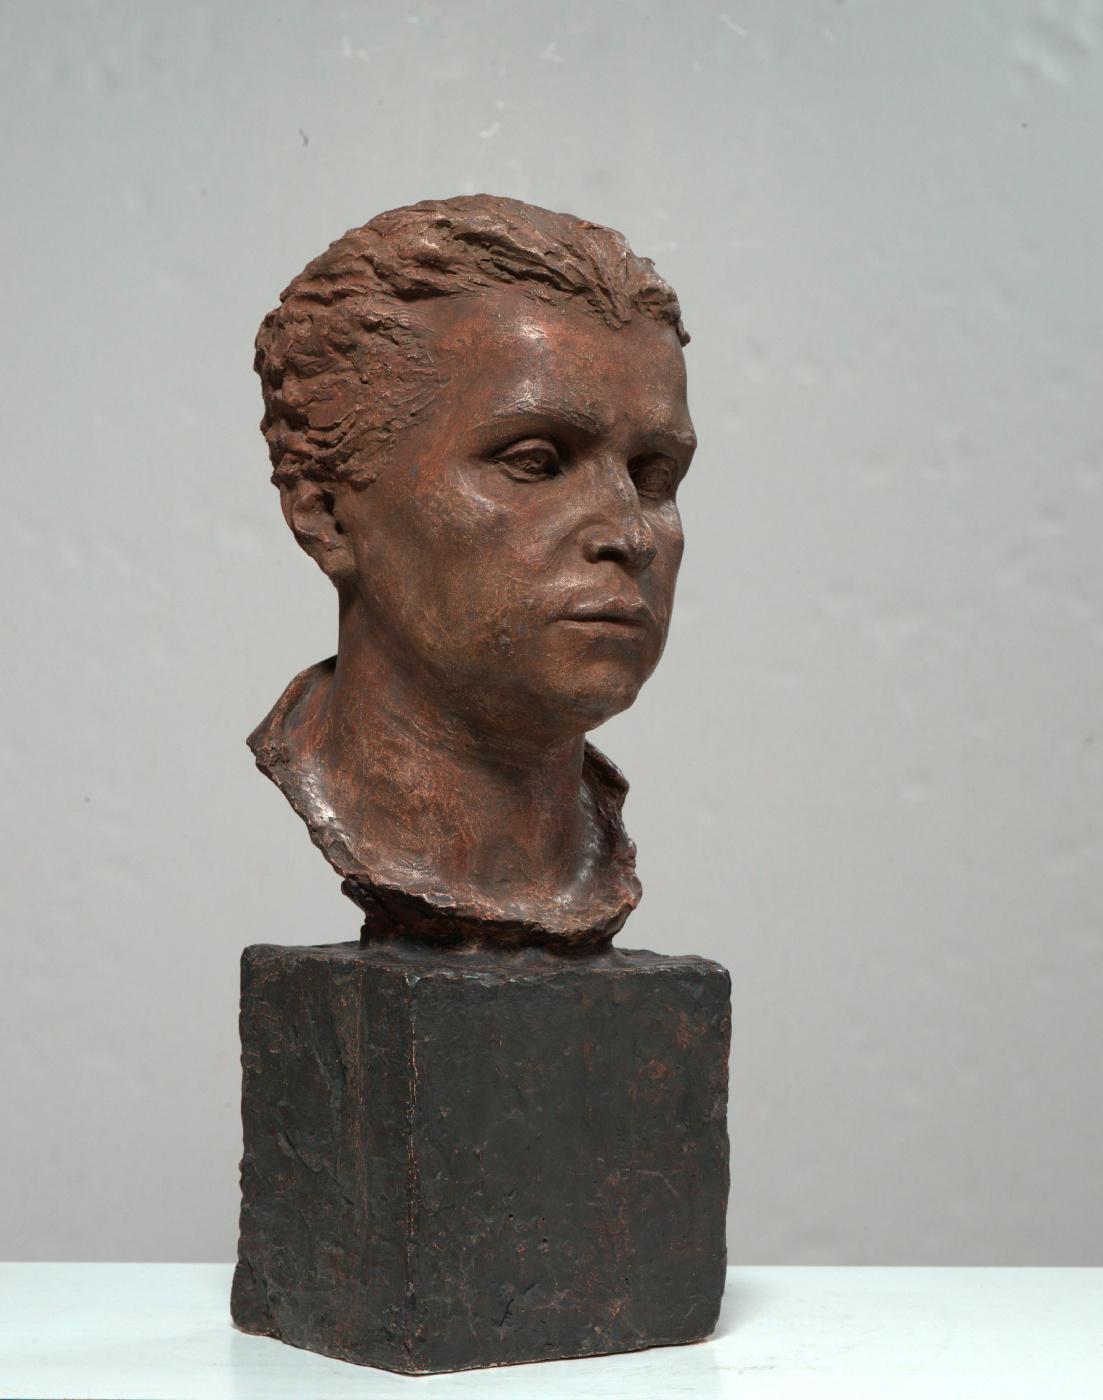 Sarah Dmitrievna Lebedeva (Darmolatova). Portrait of the sculptor Vera Ignatievna Mukhina